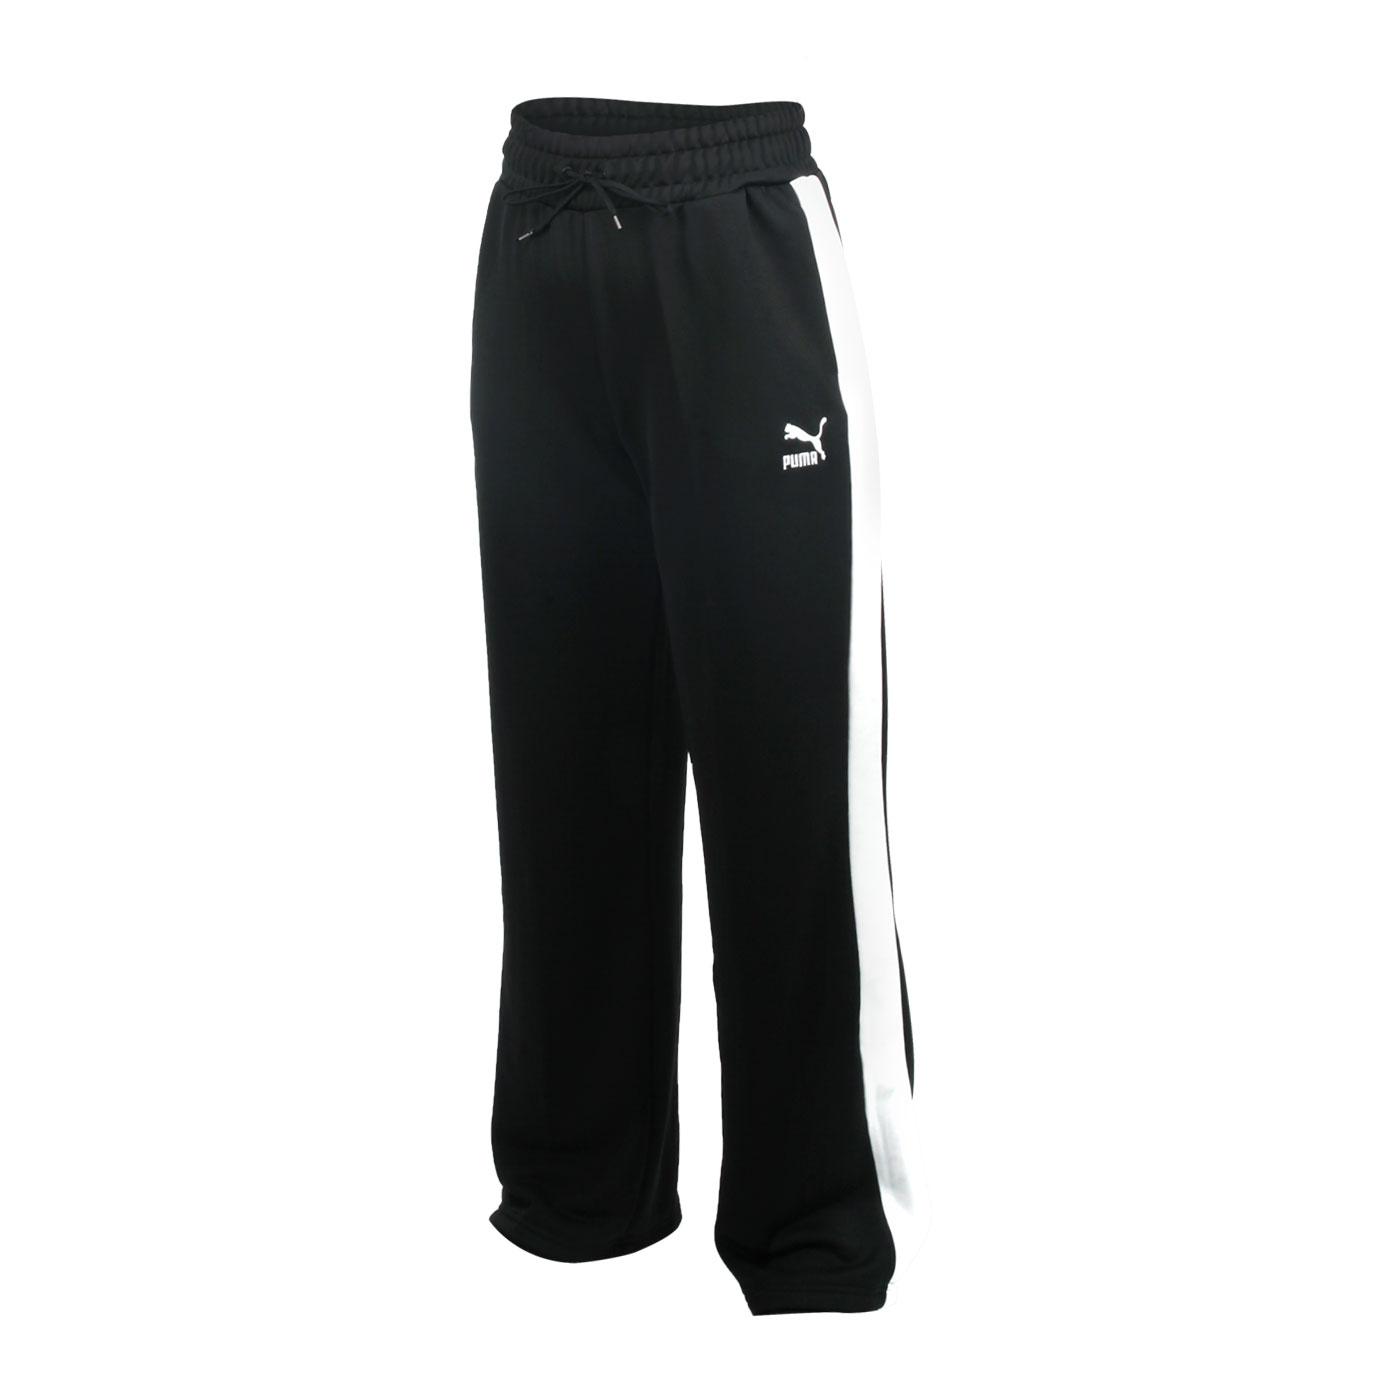 PUMA 女款流行系列寬版長褲 59885401 - 黑白